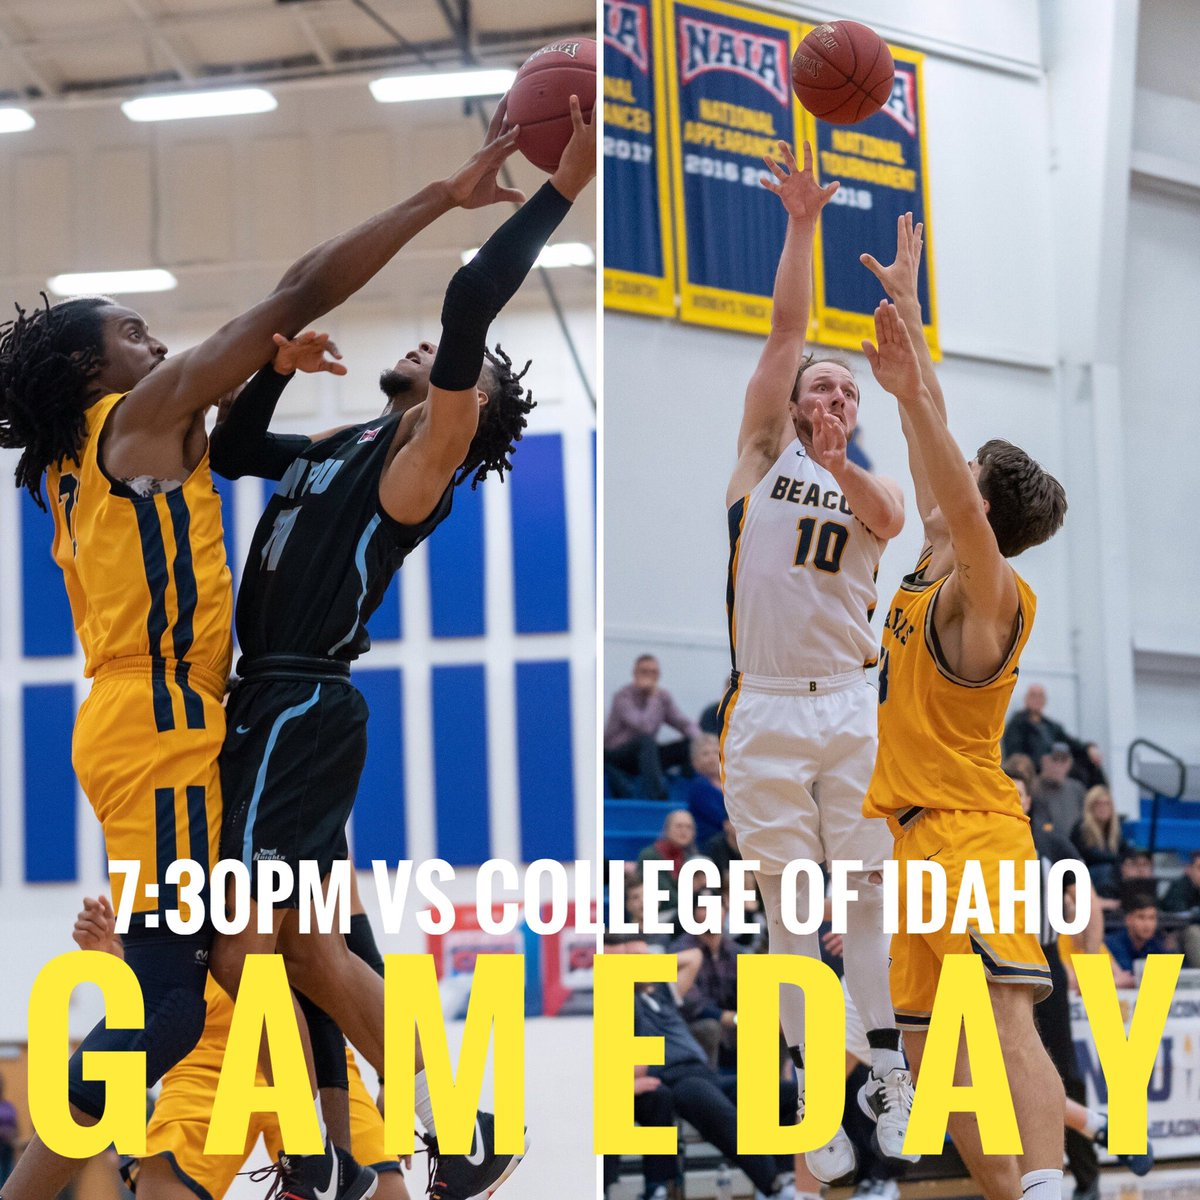 ⚡️GAMEDAY⚡️ 7:30pm vs (1)College of Idaho ⚪️FANS WEAR WHITE⚪️ #gobeacons #family